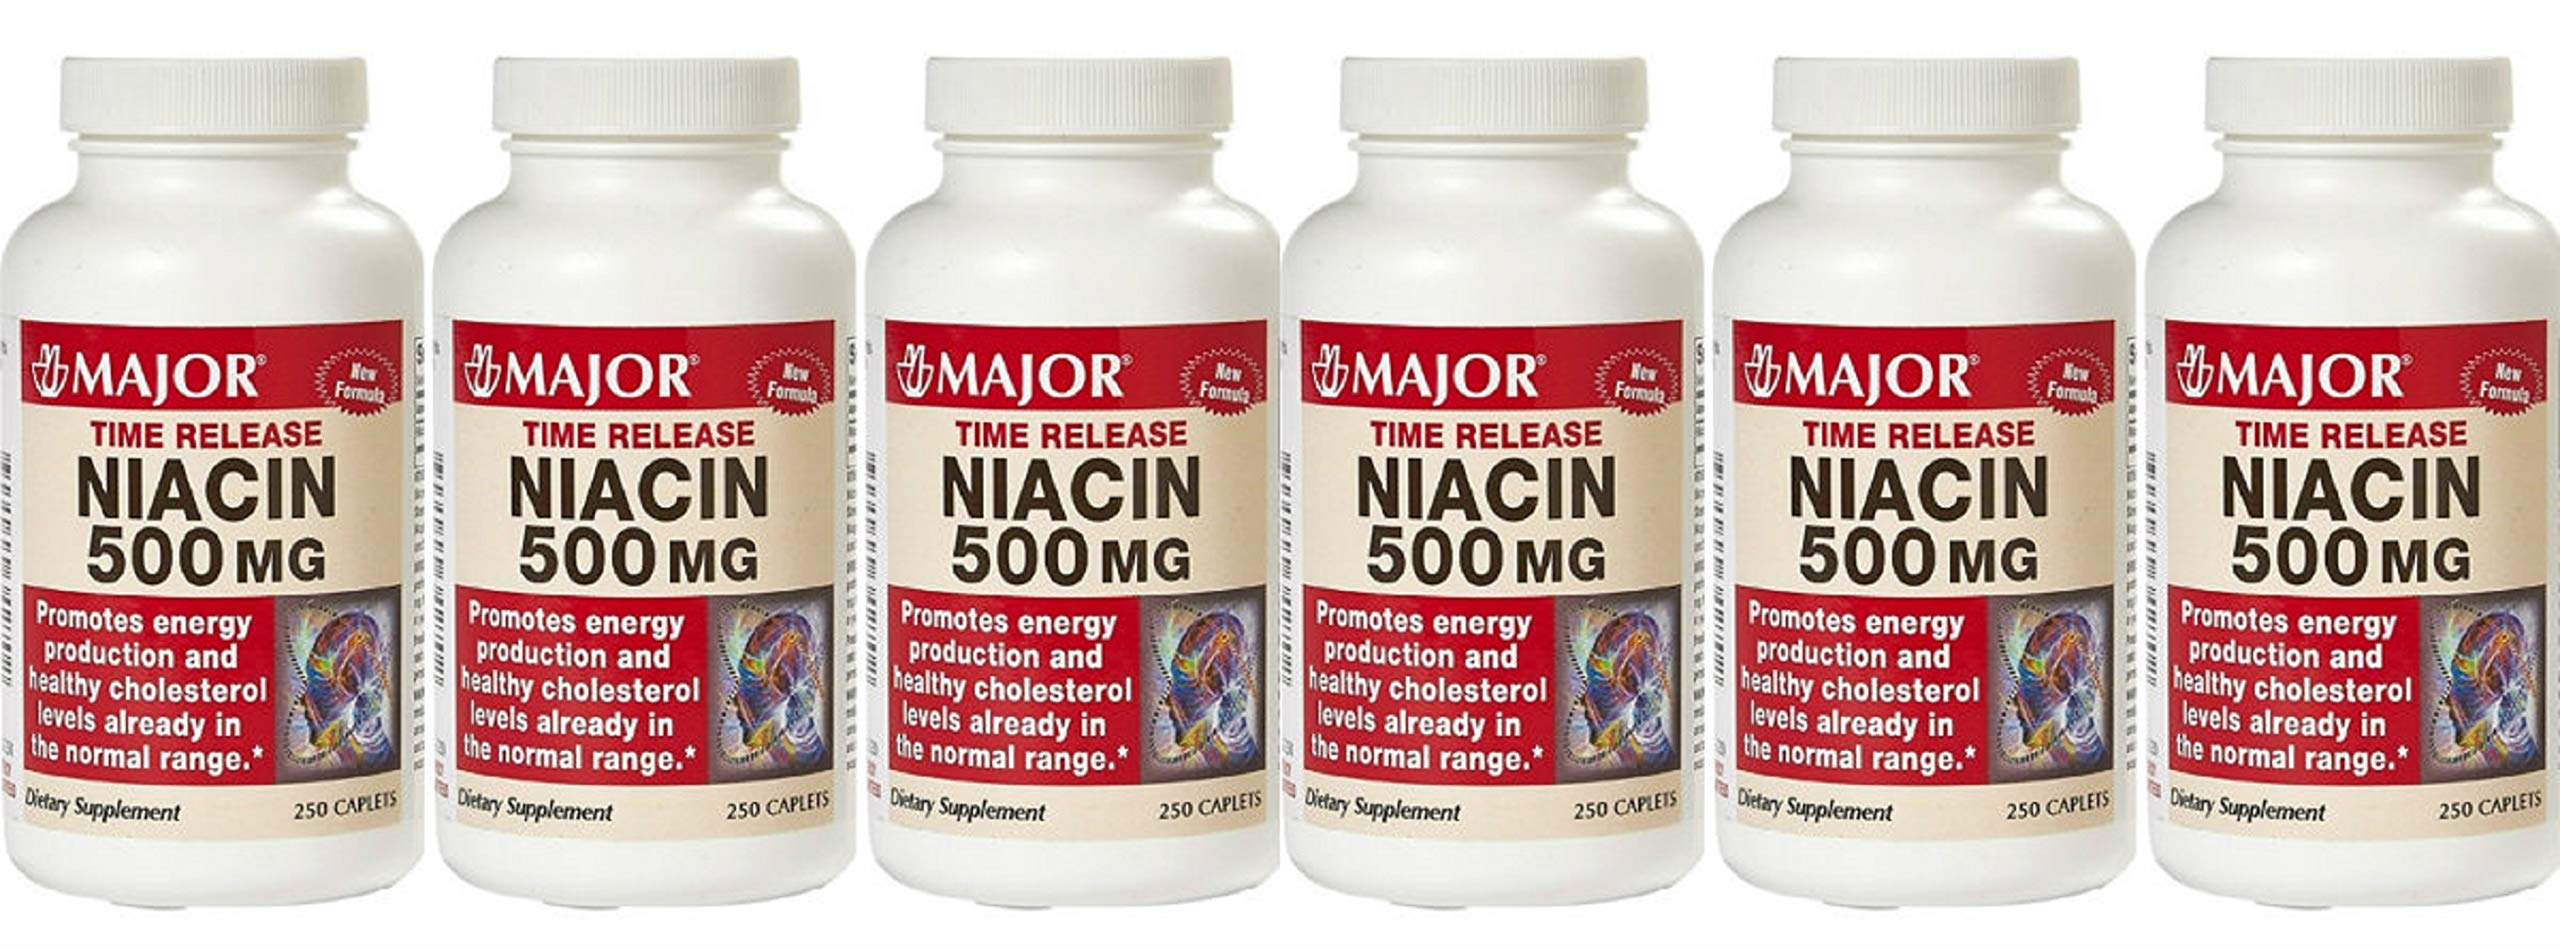 (6 Pack) MAJOR NIACIN TR 500MG CAPLETS NIACIN-500 MG White 250 CAPLETS UPC 309044342702